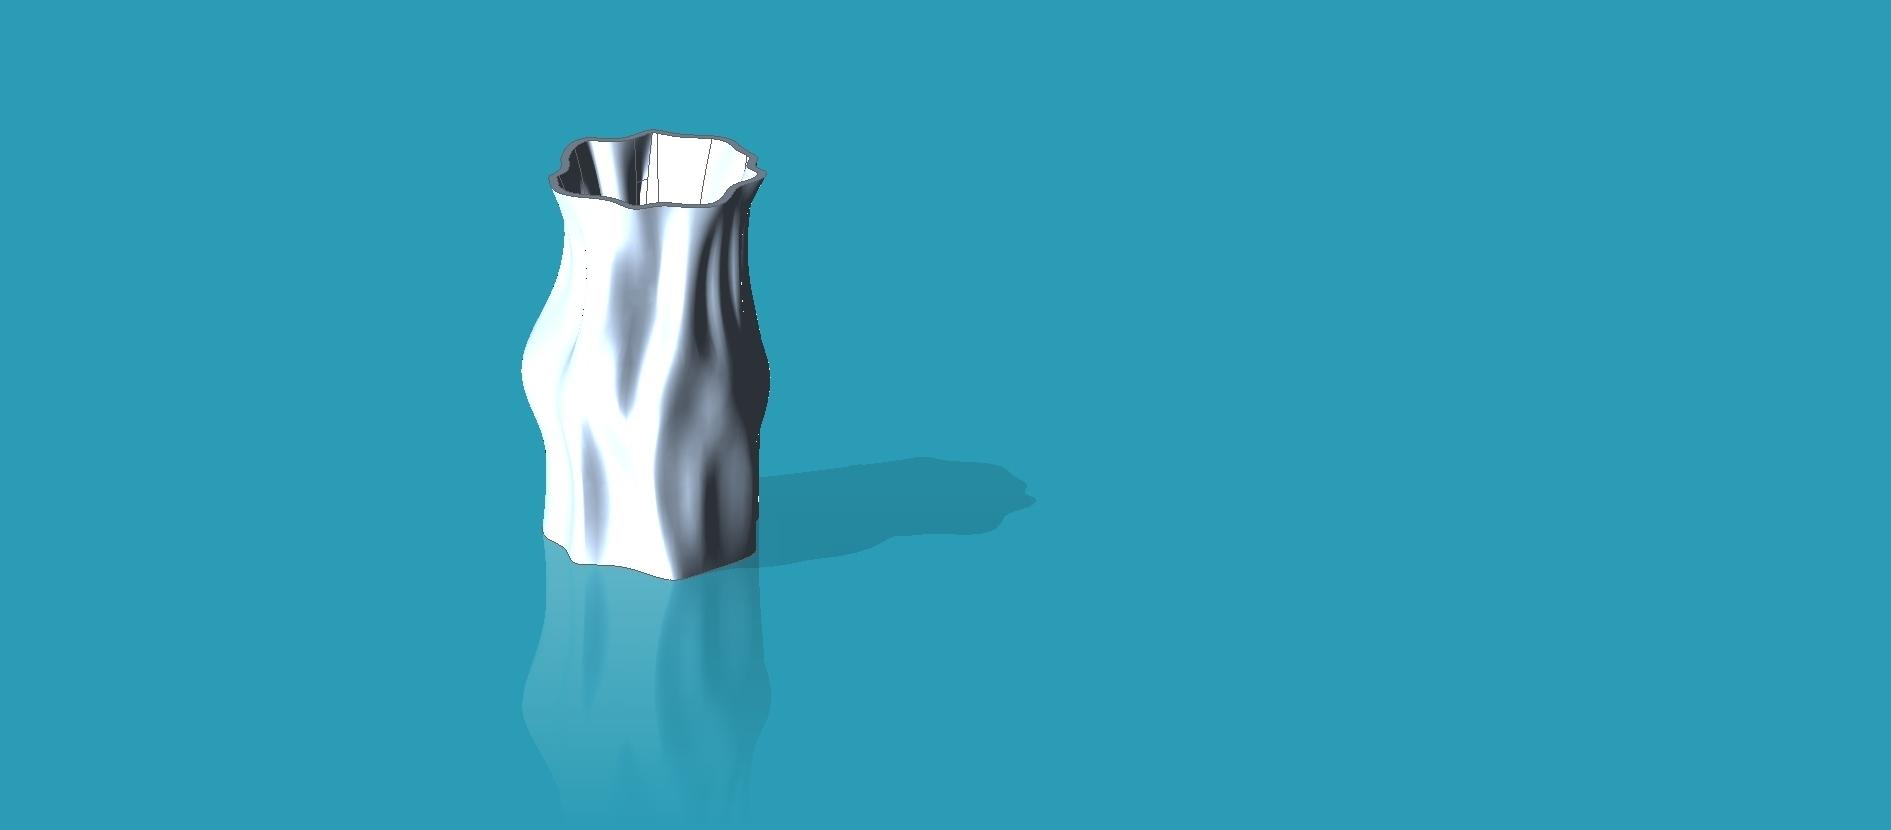 irregular pot.jpg Download free STL file irregular thing (pot) • 3D print object, punkain86